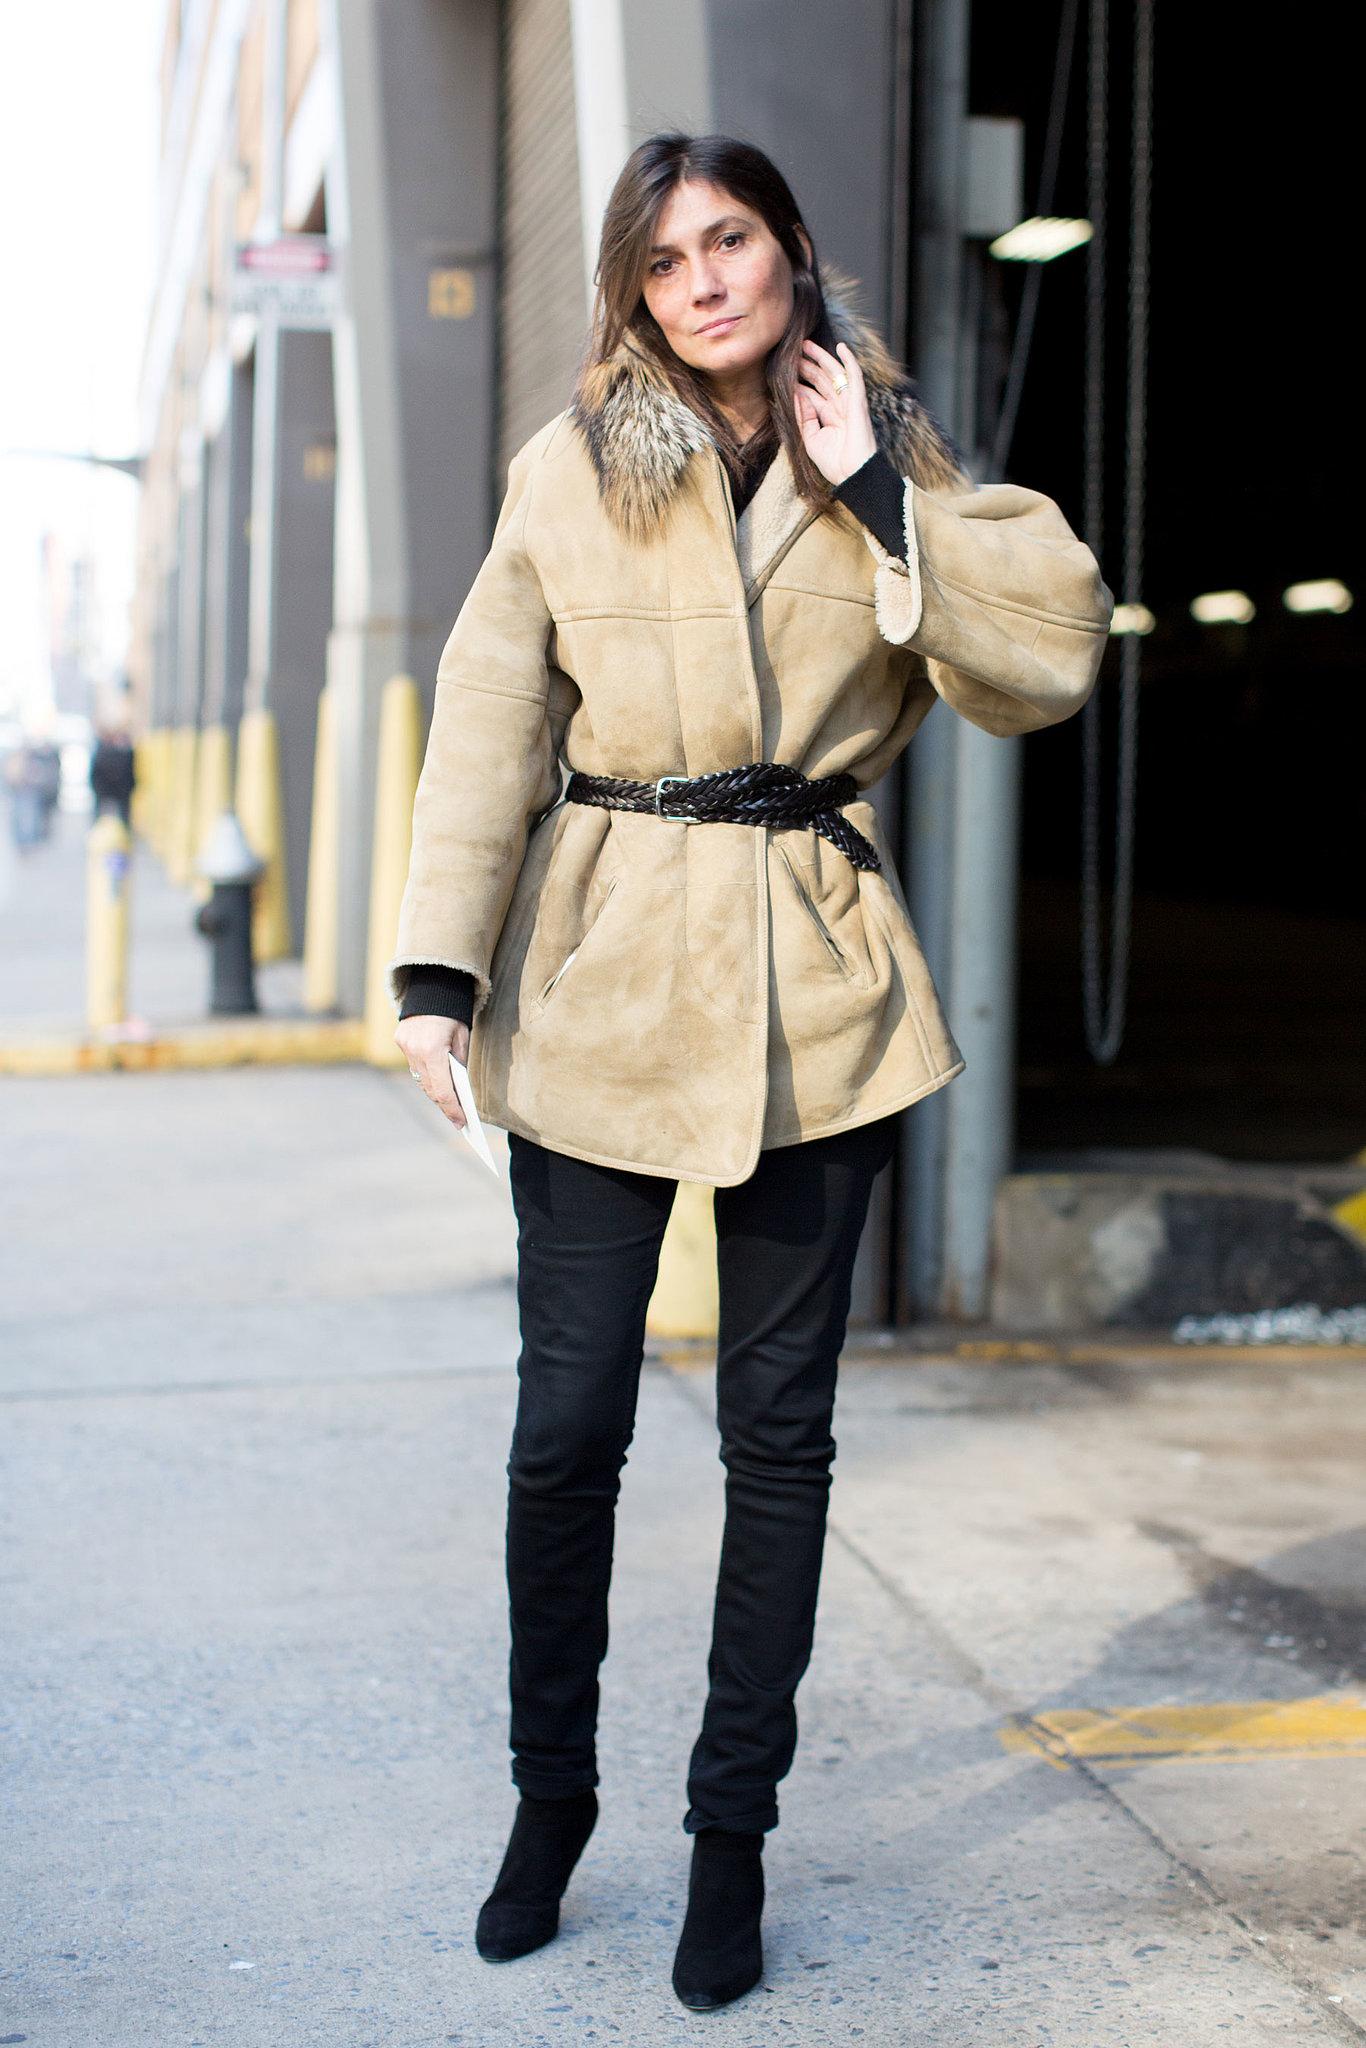 Emmanuelle Alt Style Du Monde: Emmanuelle Alt Didn't Complicate Her Winter Look